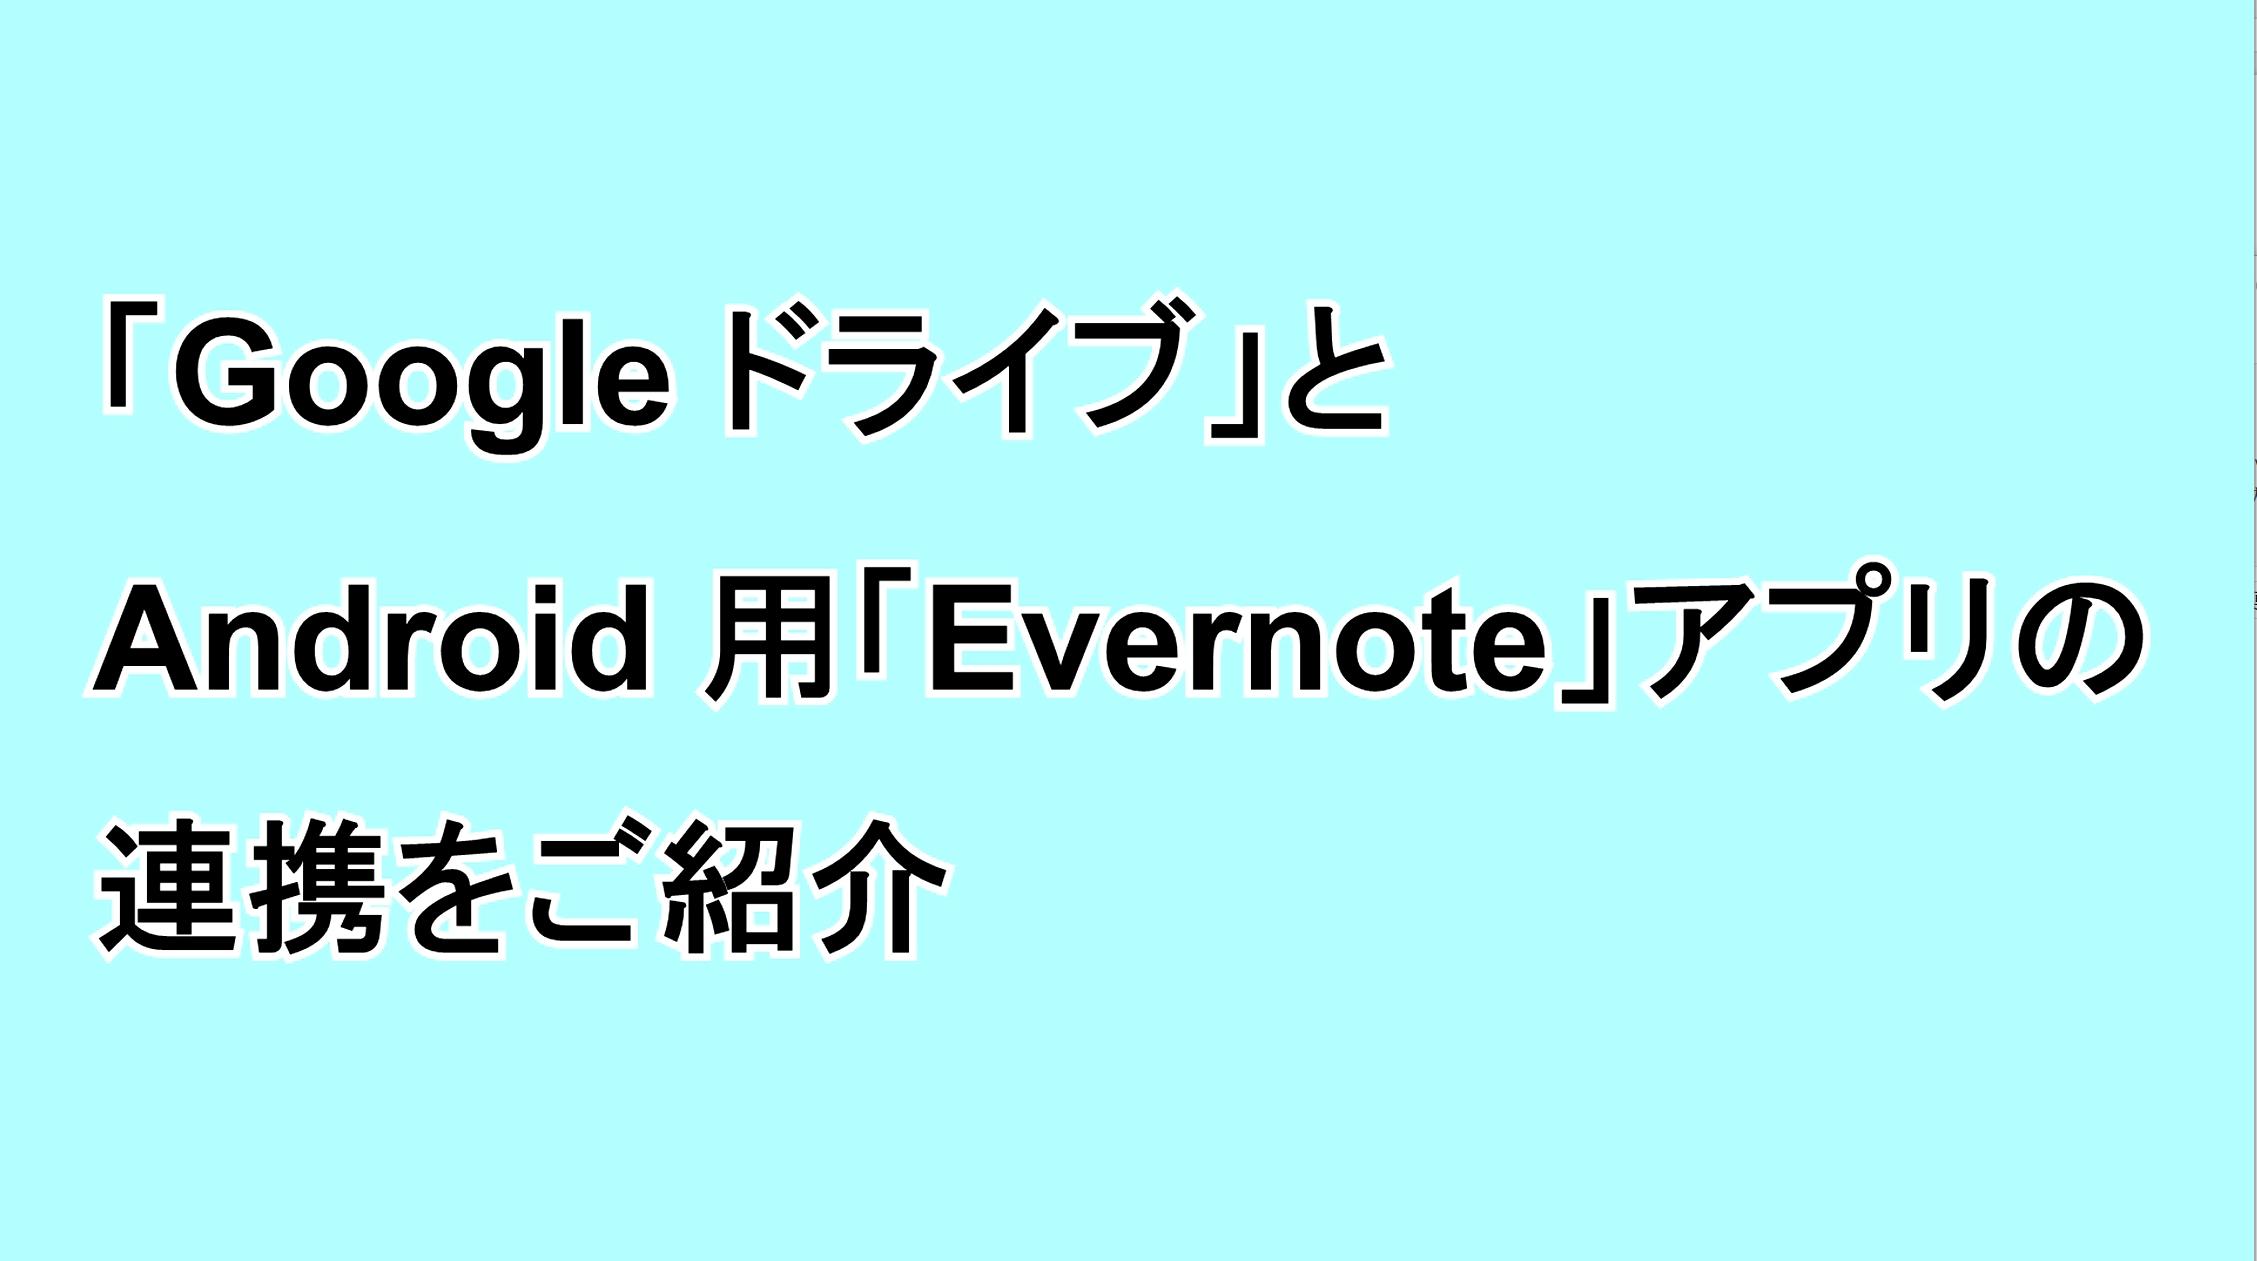 「Google ドライブ」とAndroid用「Evernote」アプリの連携をご紹介